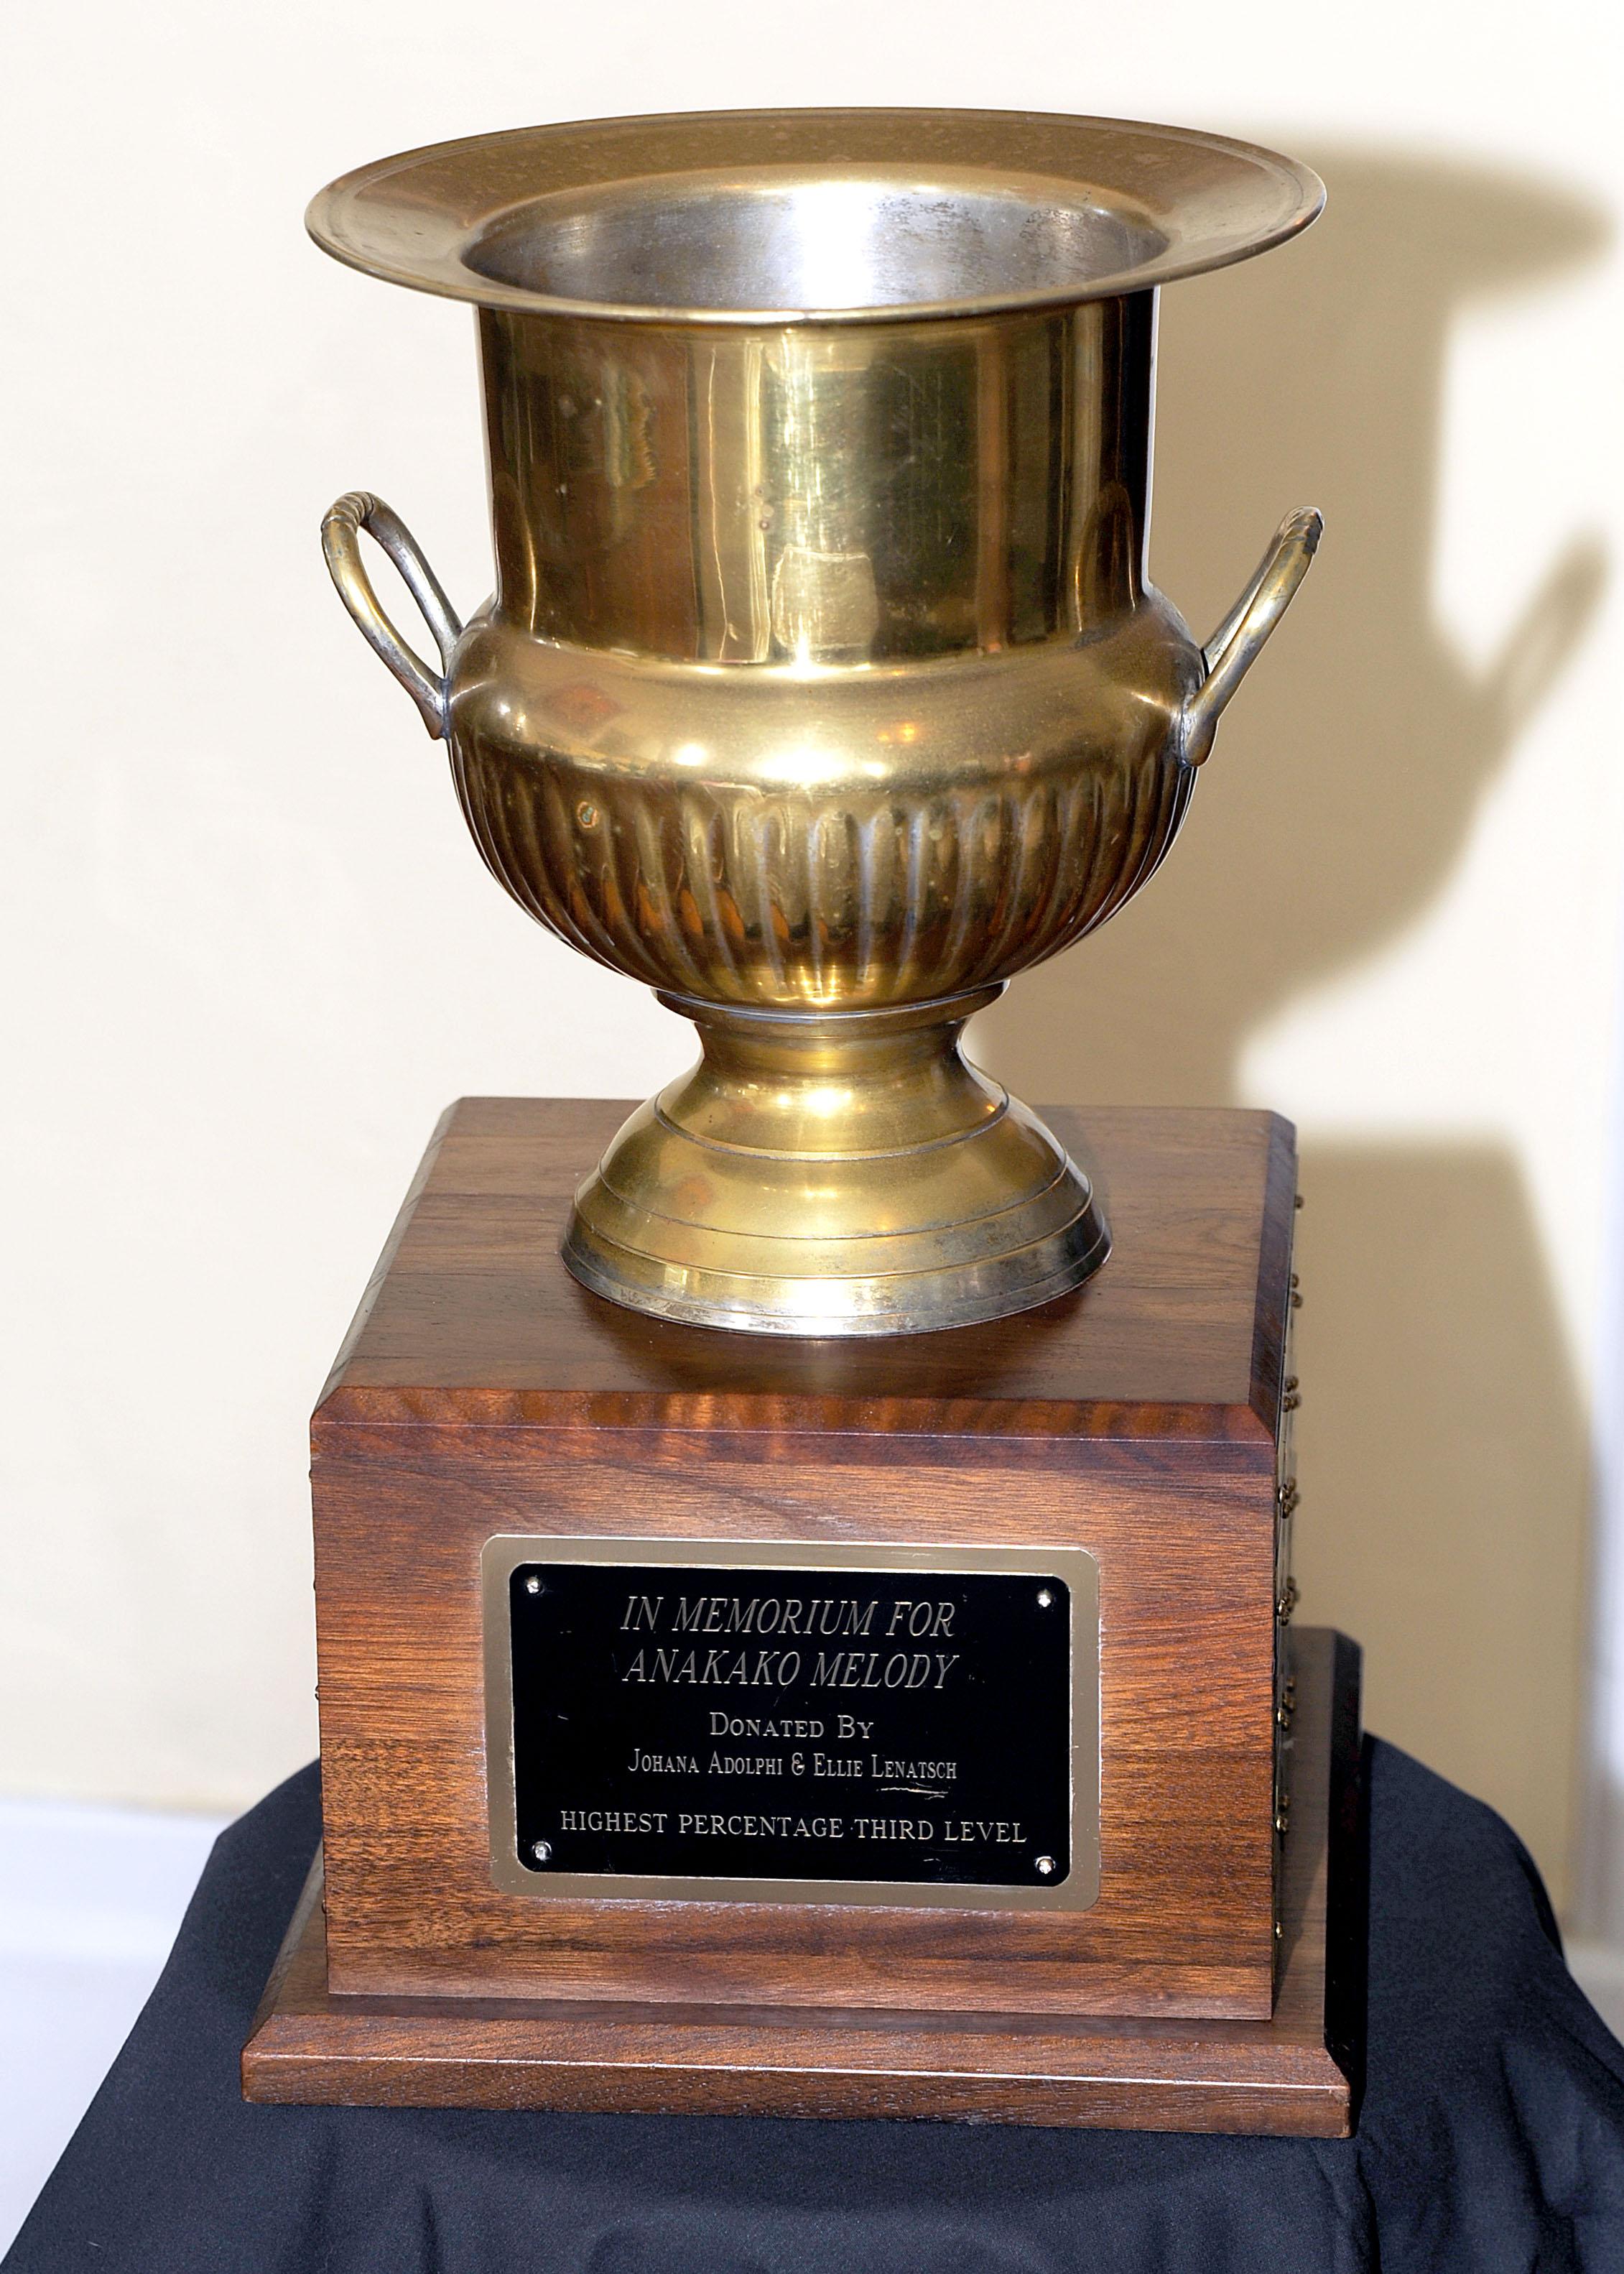 Perpetual Award - Third Level